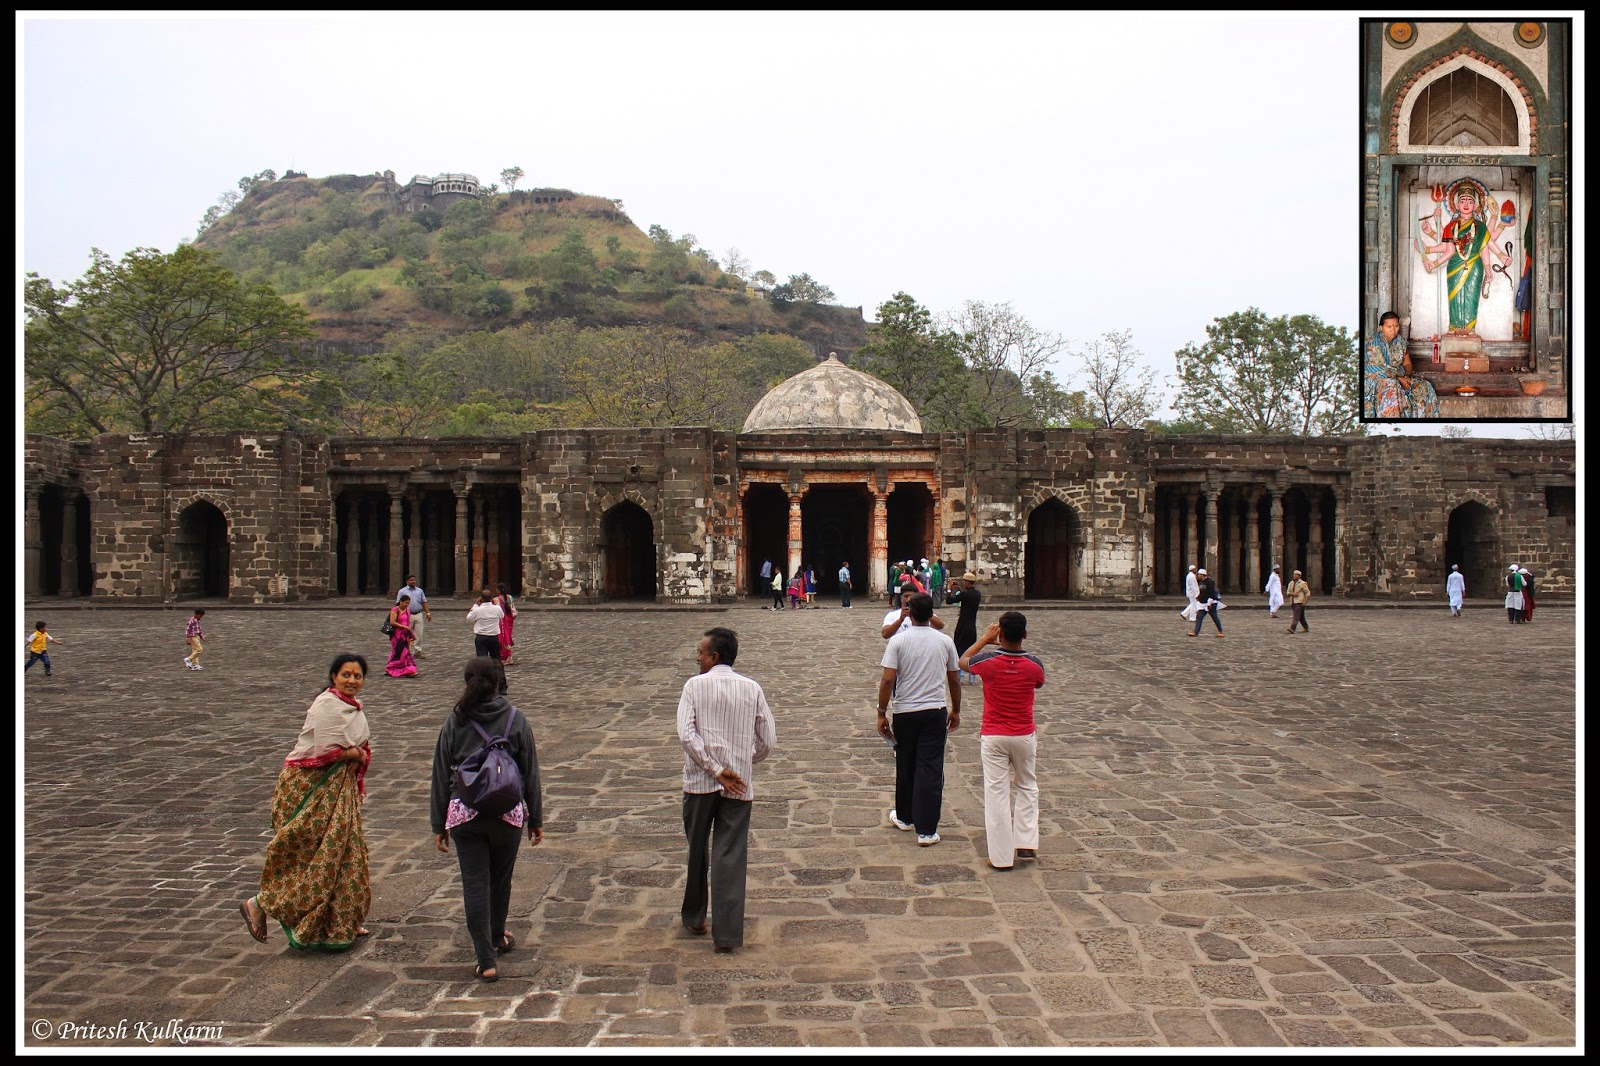 Bharatmata Temple, Daulatabad Fort